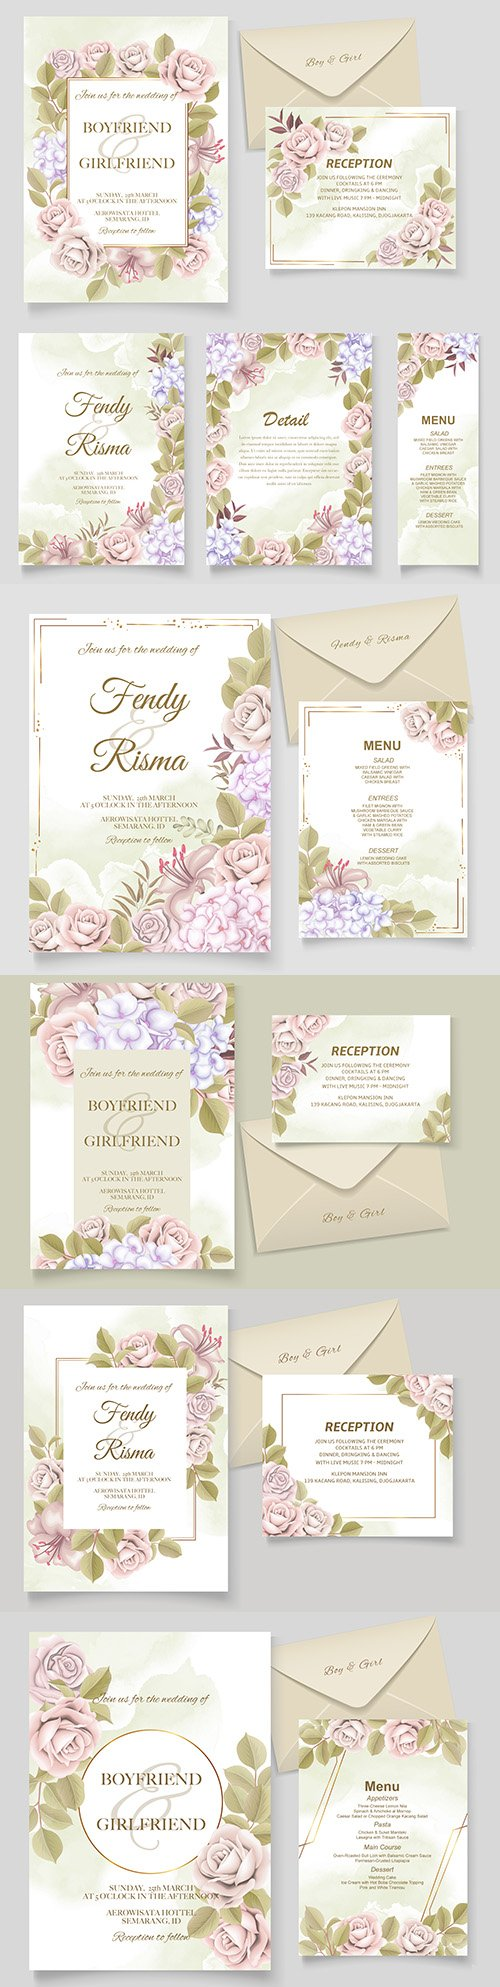 Elegant drawing wedding invitation floral design